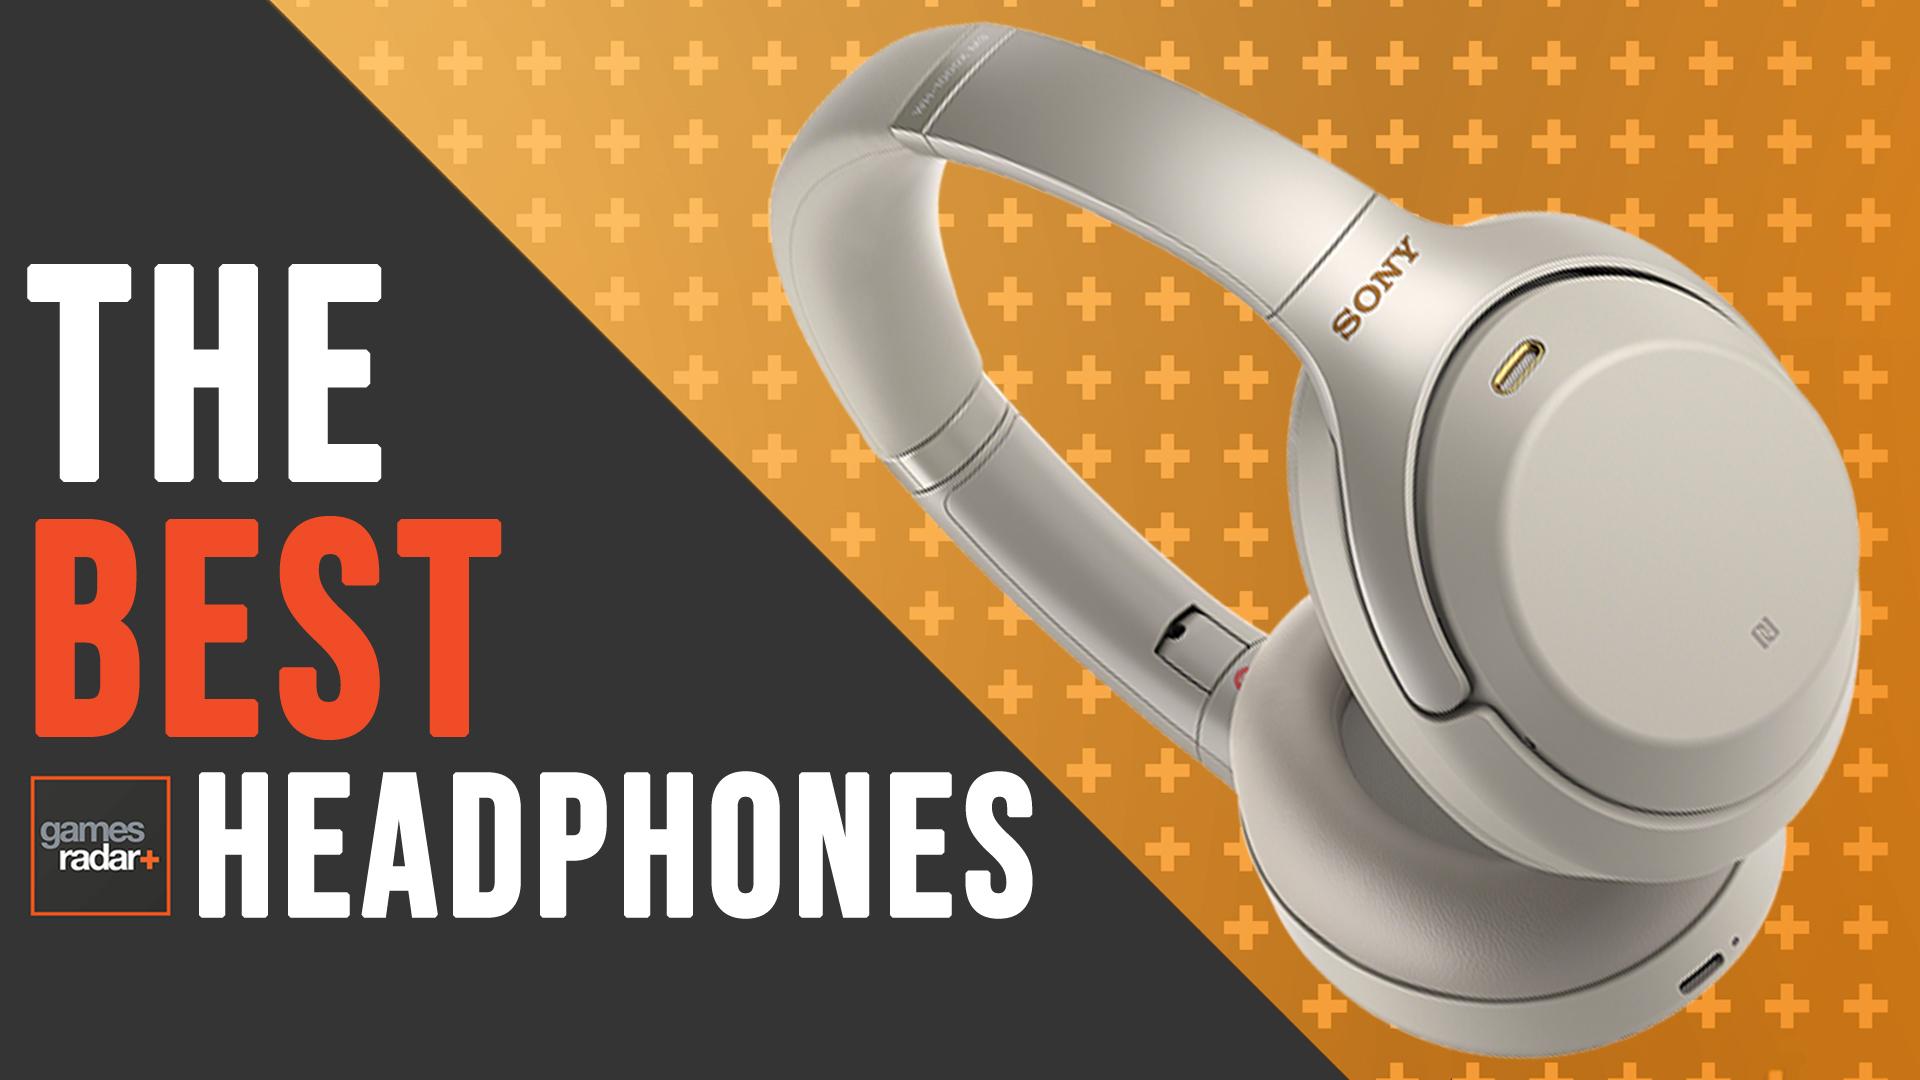 The best headphones 2020: the finest audio options compared | GamesRadar+